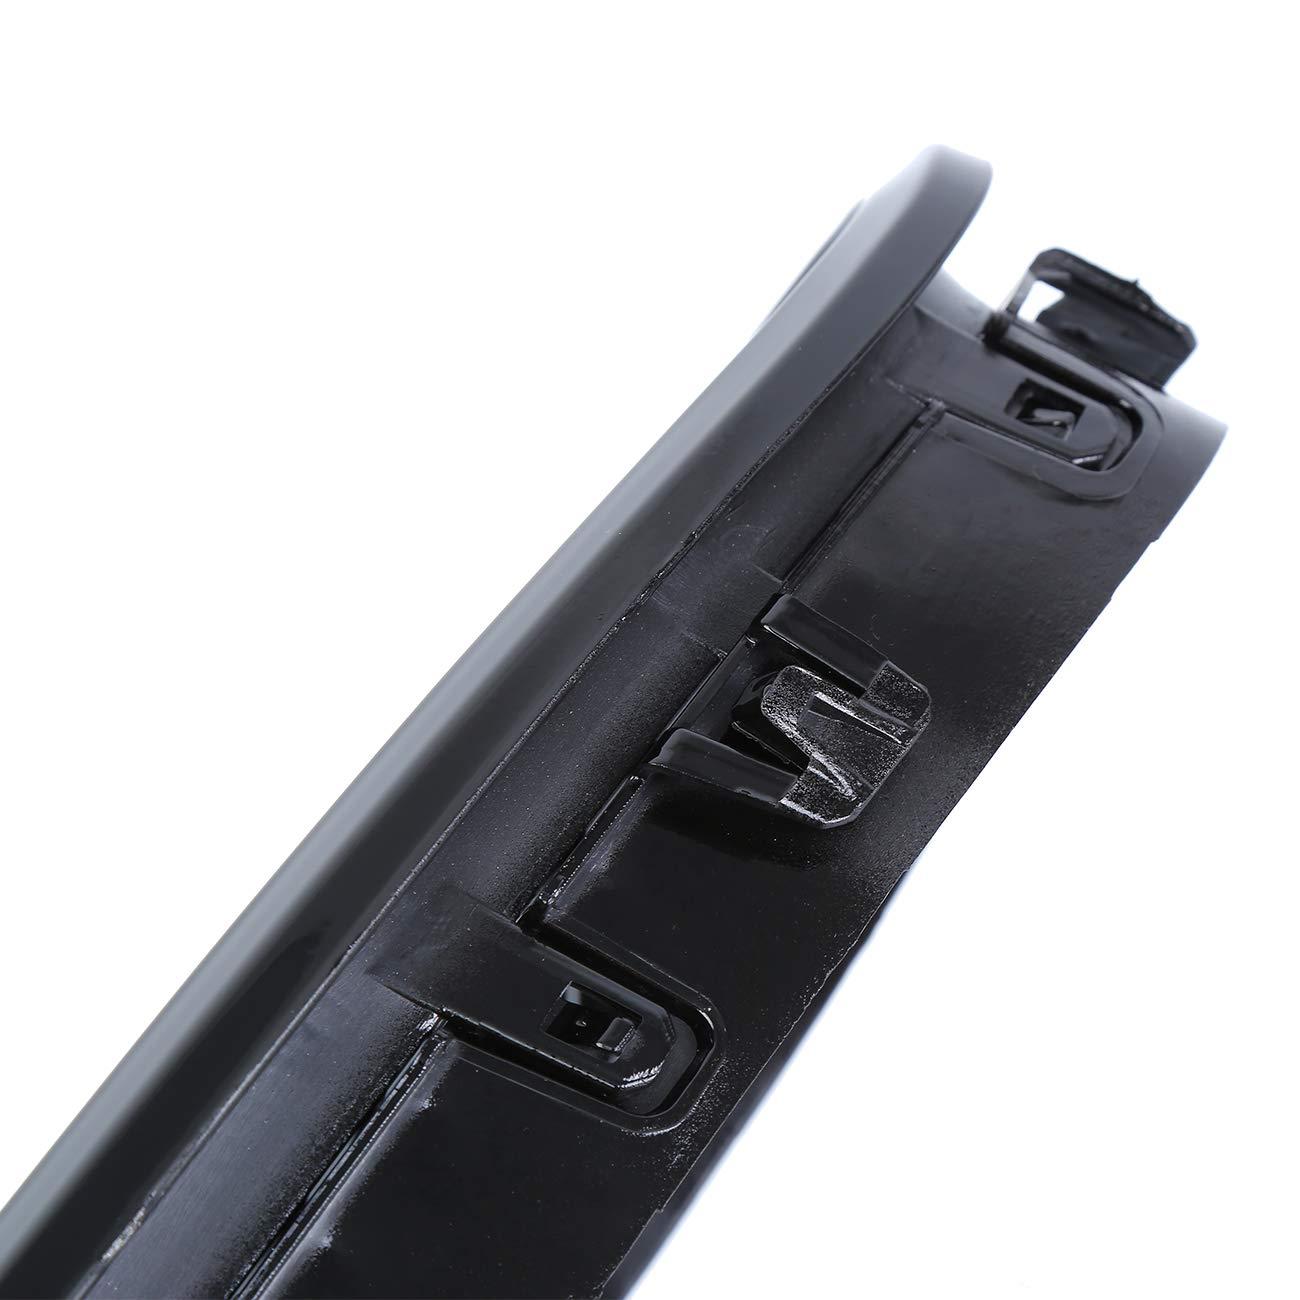 Honhill Parrilla delantera Negro brillante Linea dual Rejilla De Ri/ñon para Serie 5 F10 F11 F18 2010-2015